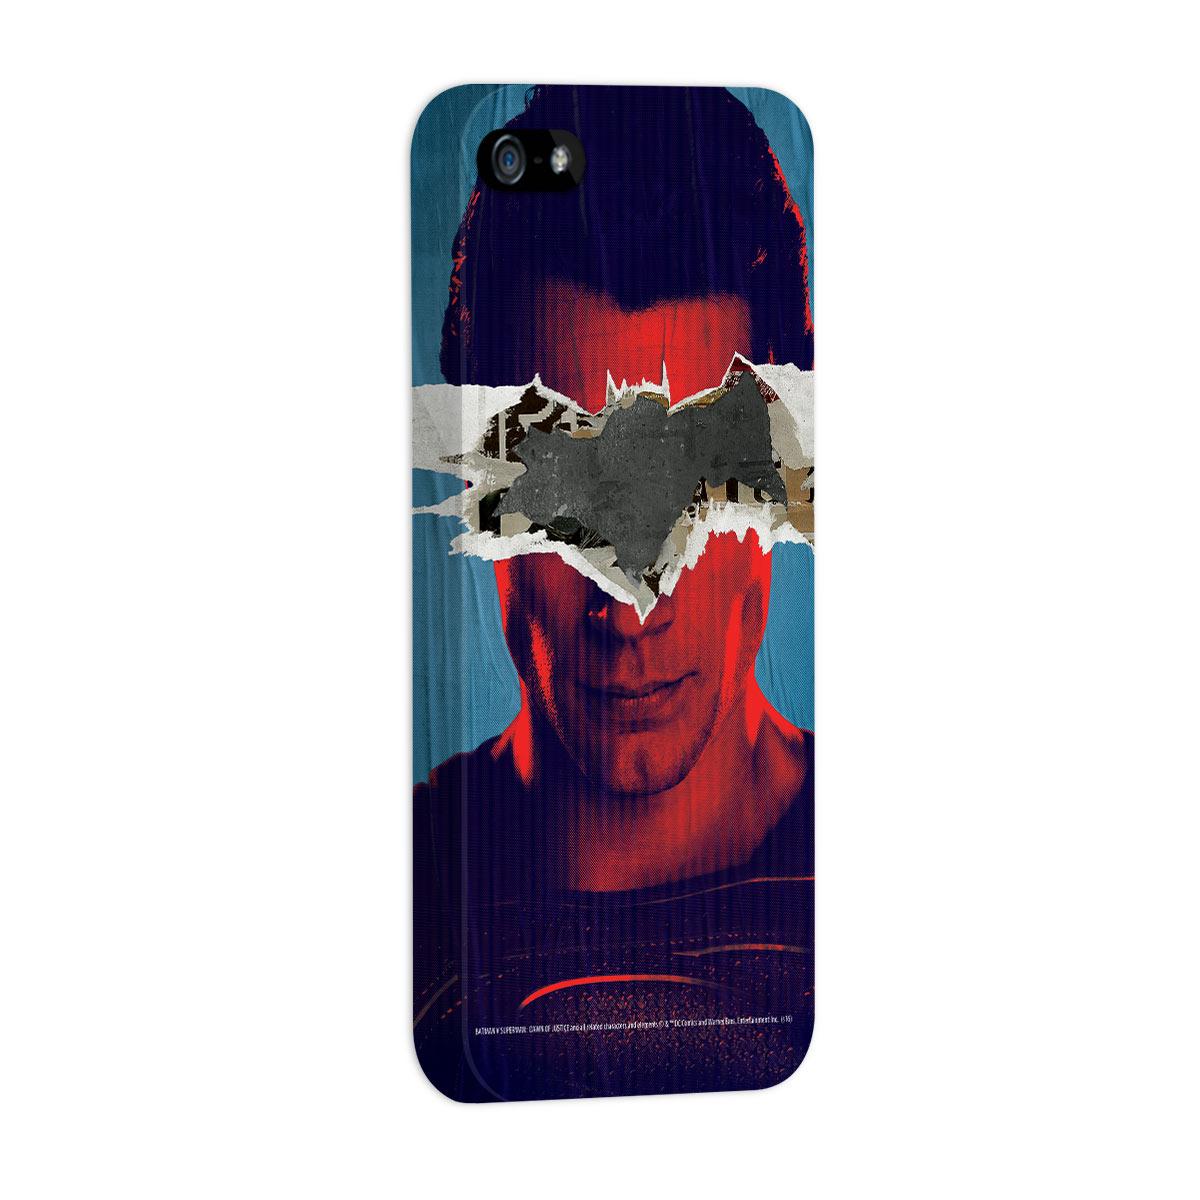 Capa para iPhone 5/5S Batman VS Superman Man VS God  - bandUP Store Marketplace